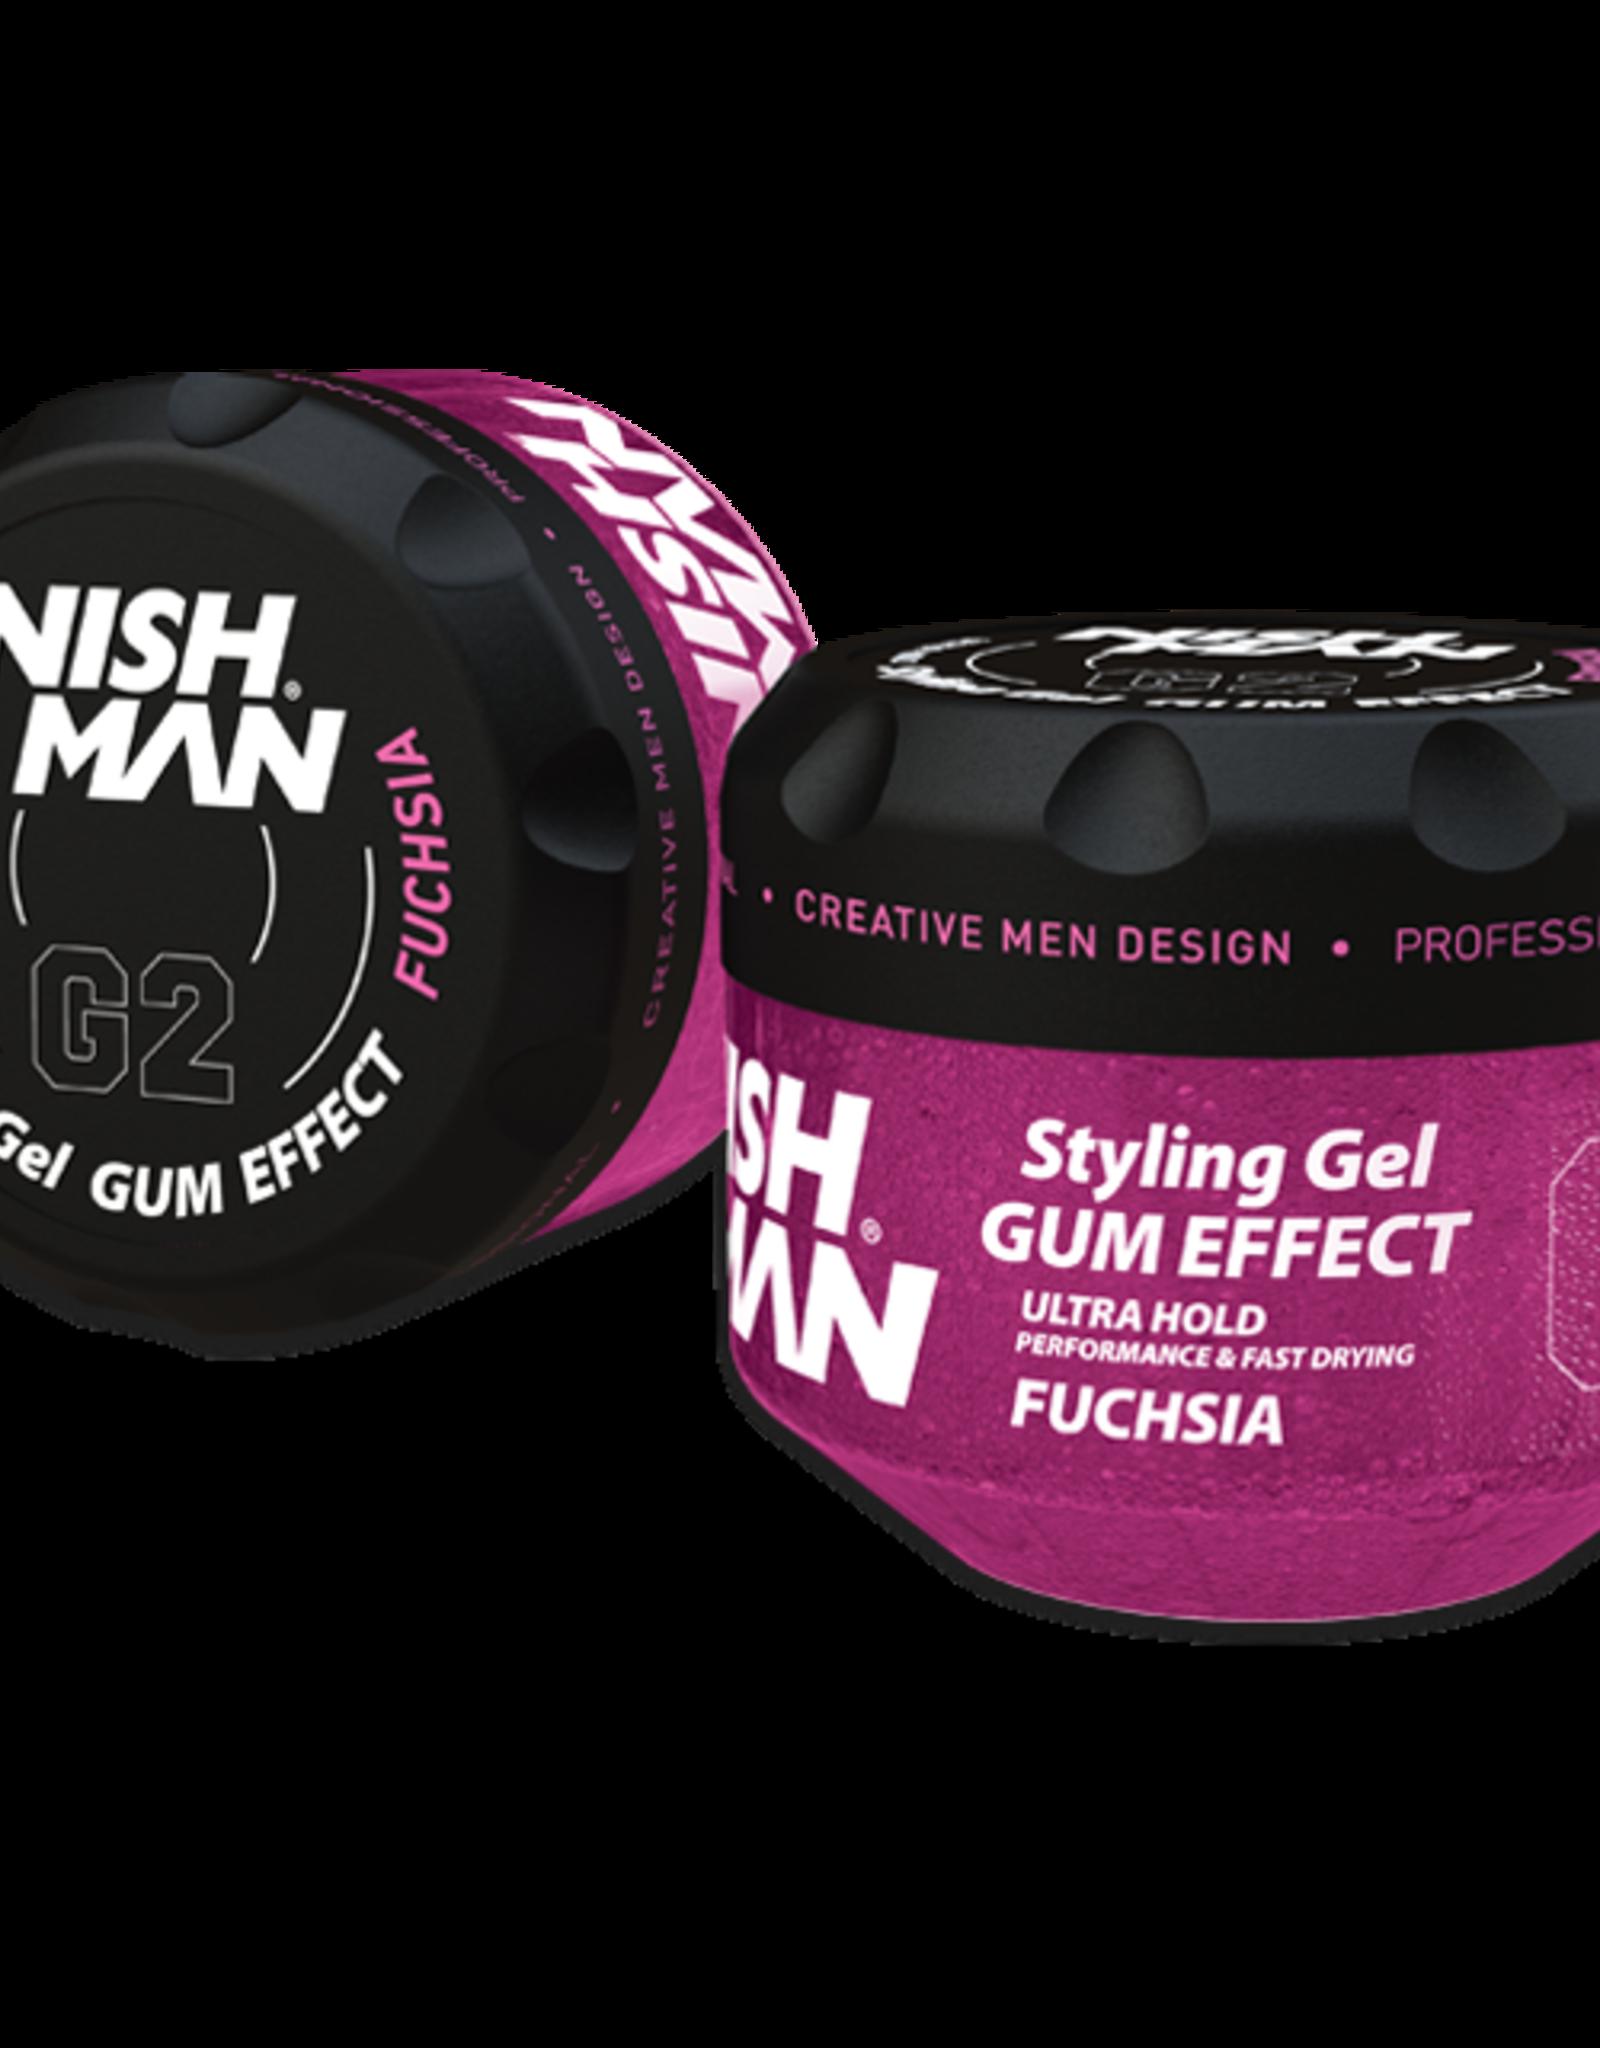 Nishman Hair Styling Gel